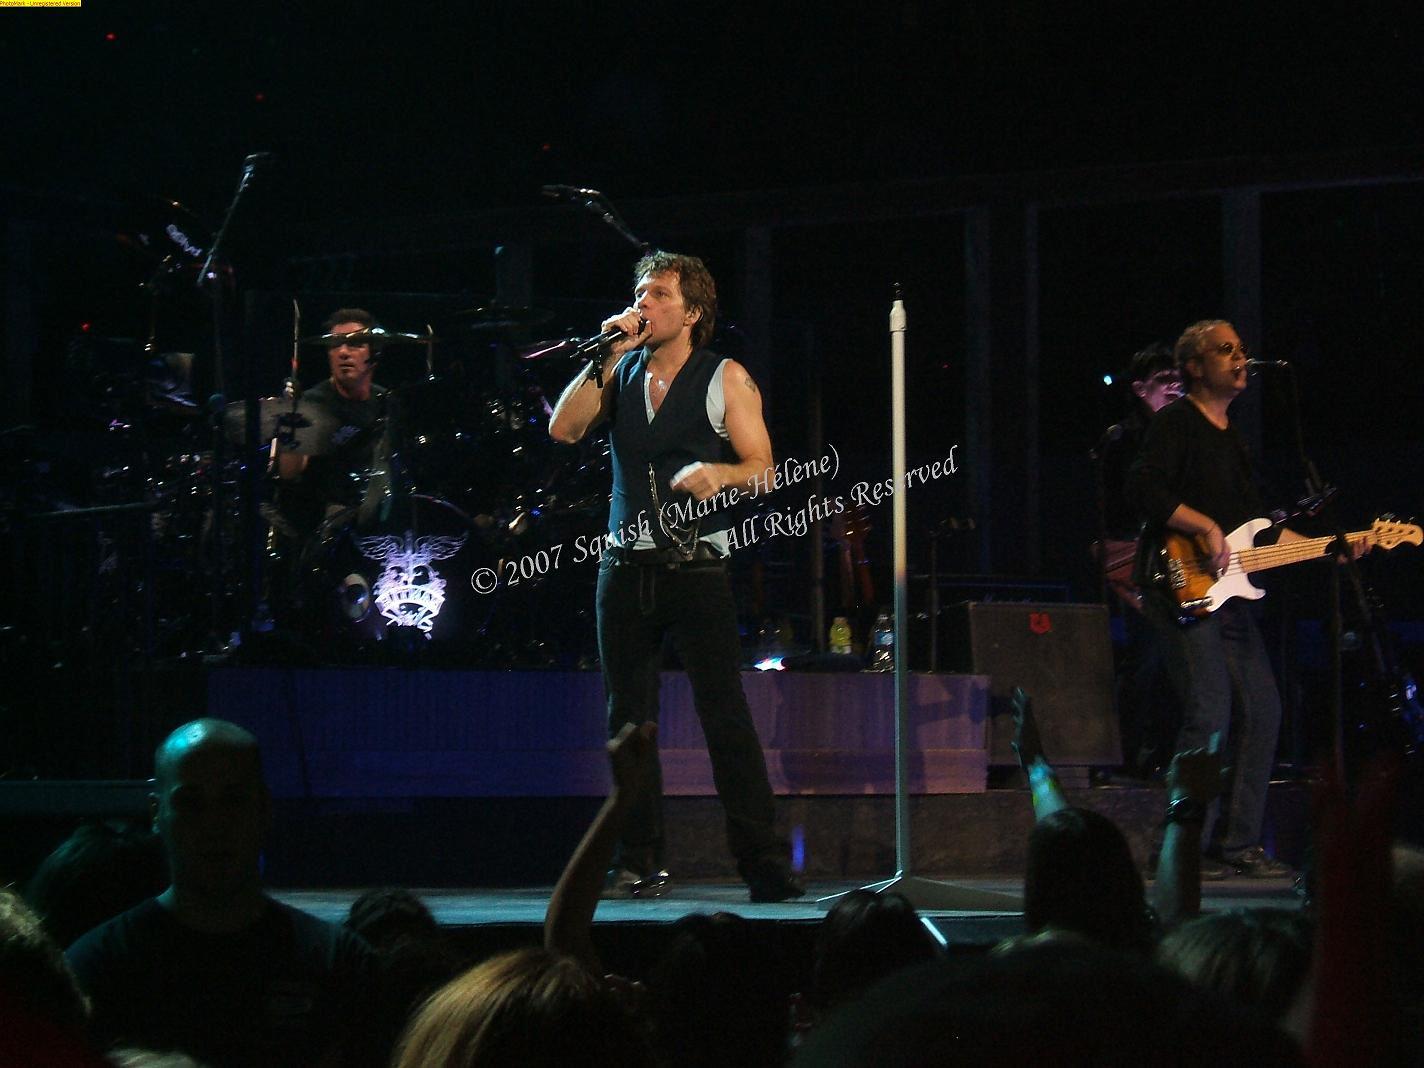 Bon Jovi - Bell Centre, Quebec, Canada (November 14, 2007)